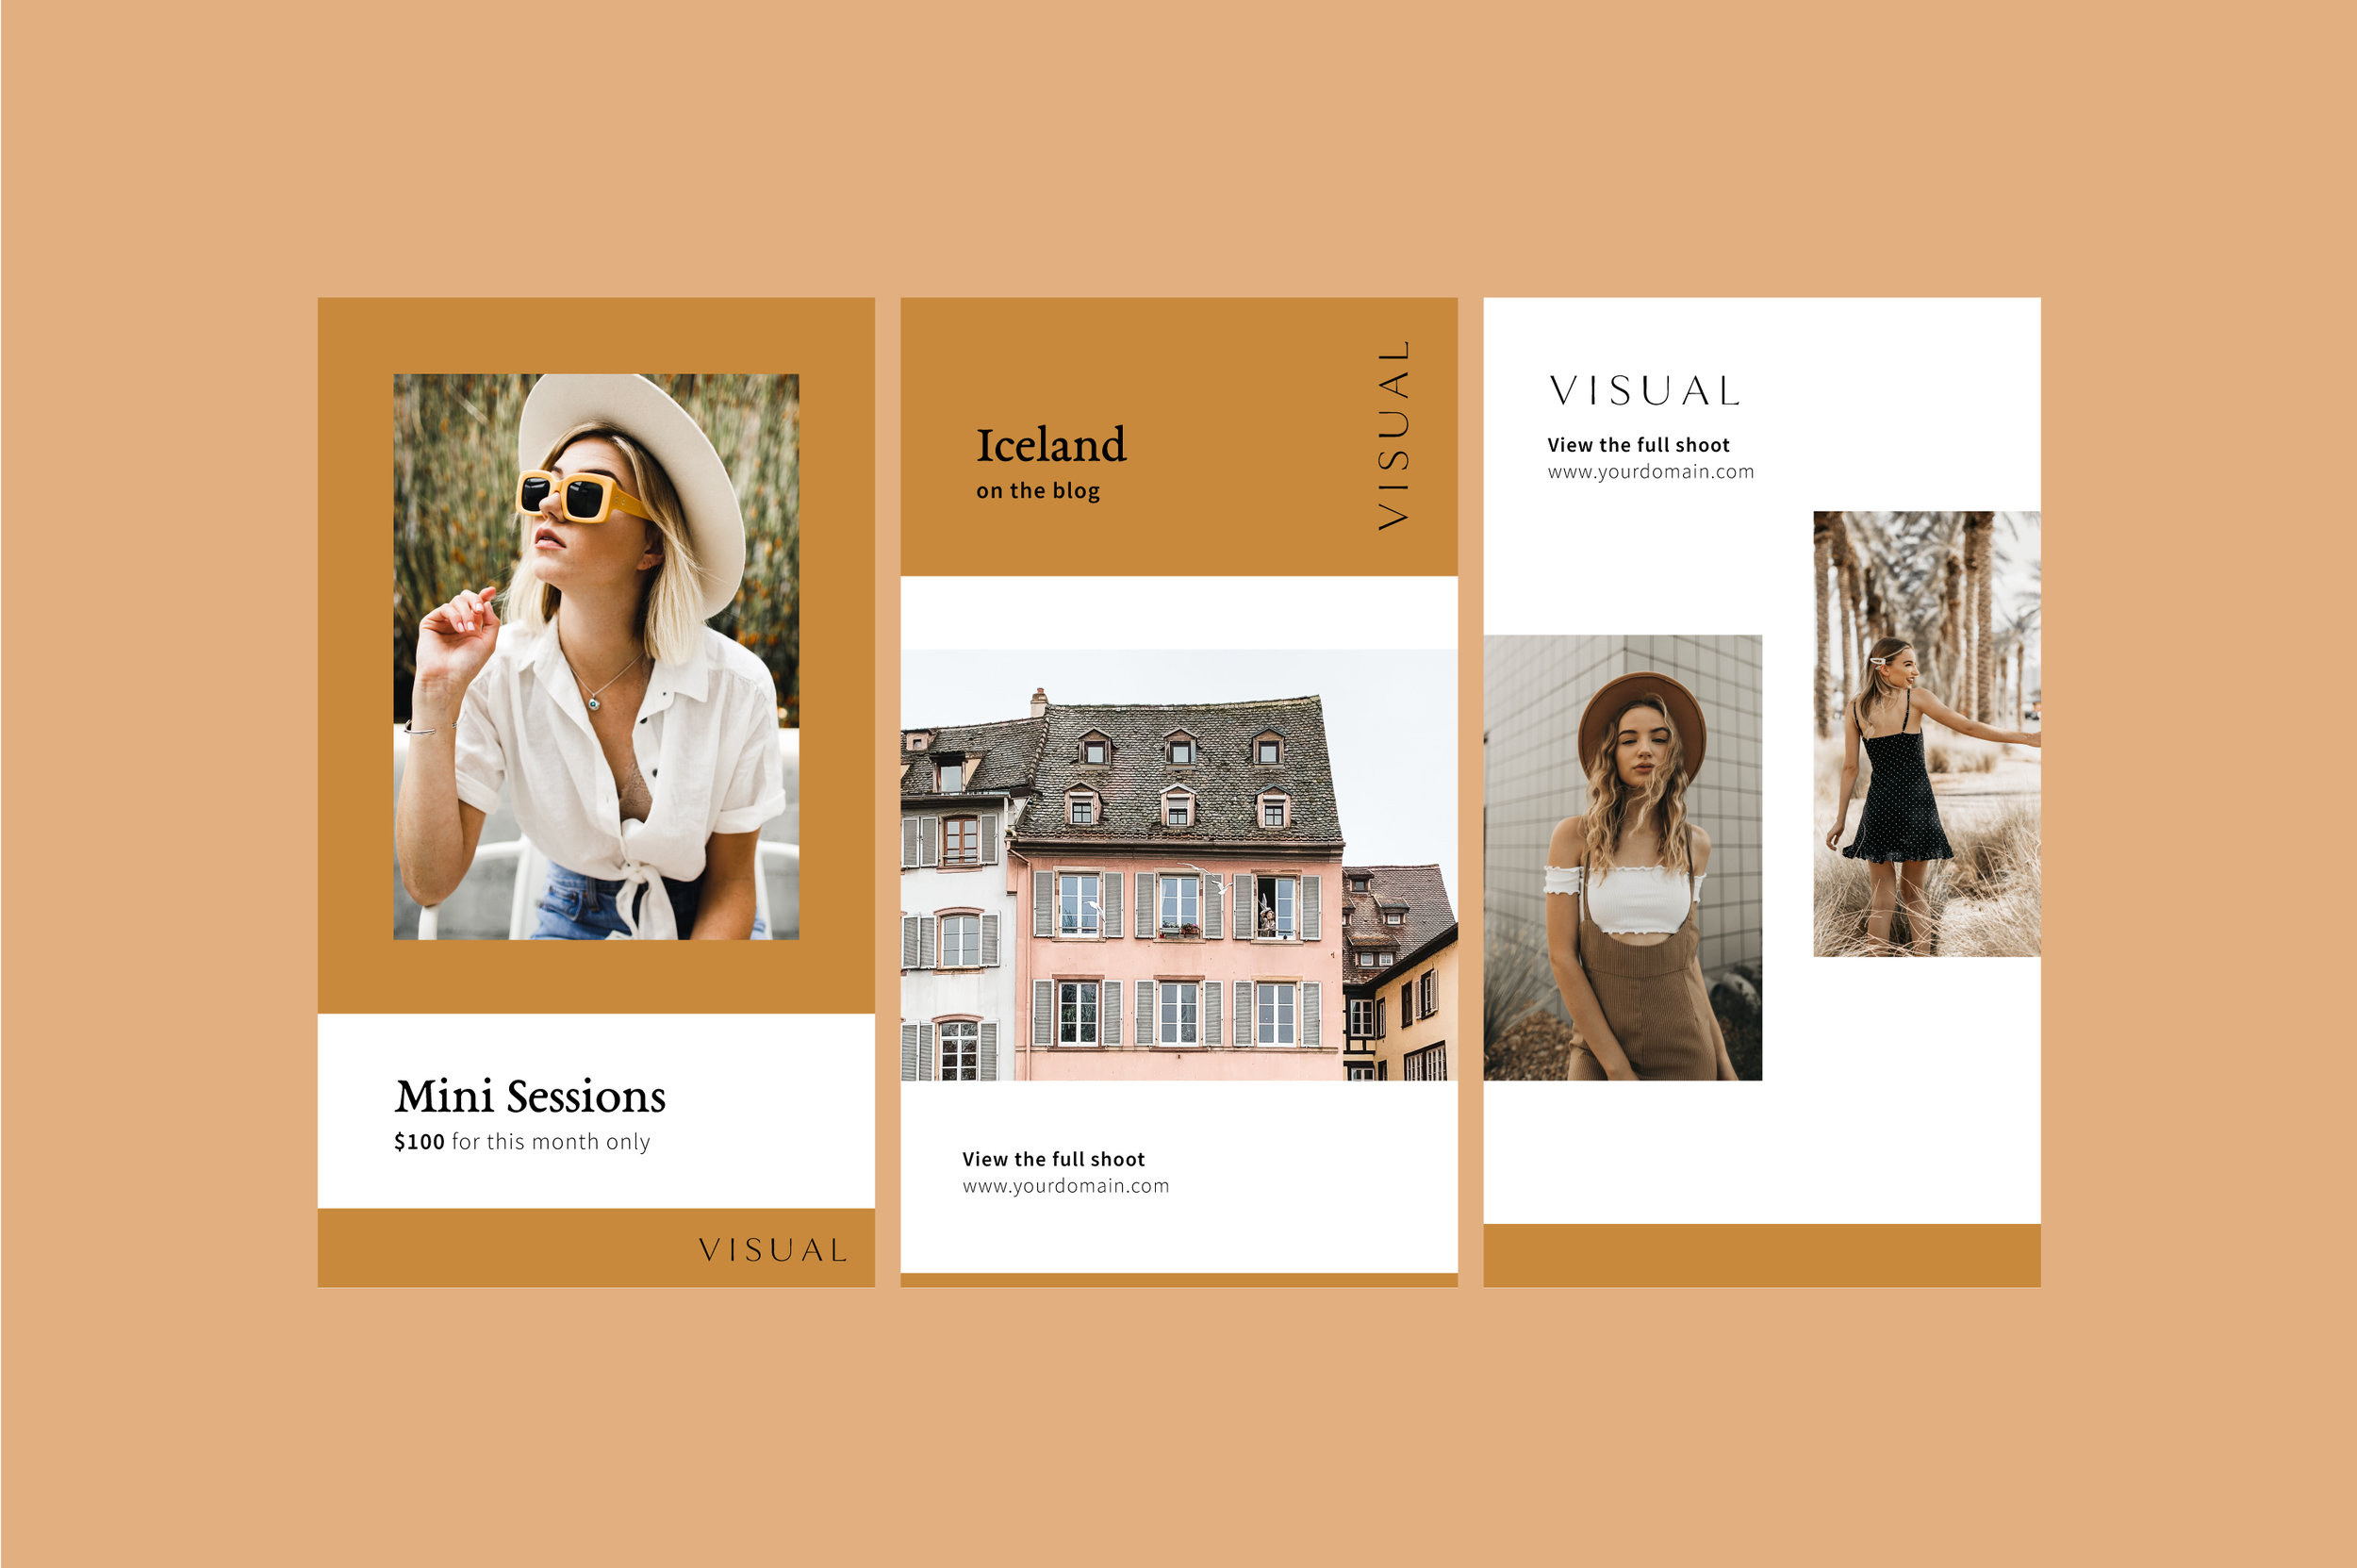 visual-Insta-template-cover2.jpg